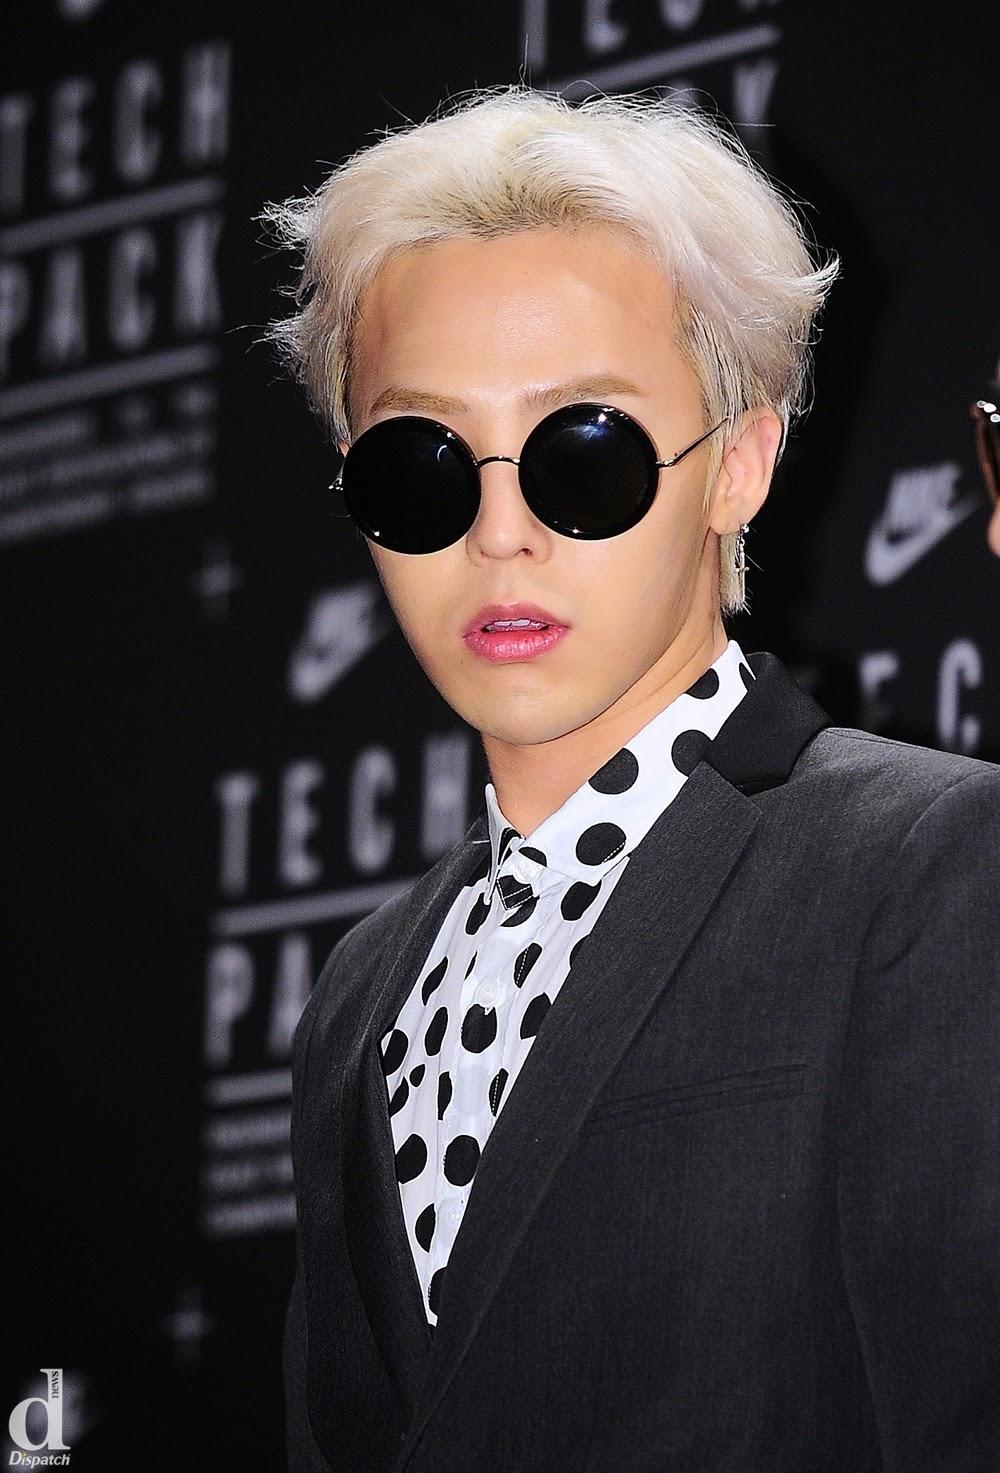 G Dragon Bigbang Fashion Nail Art Sticker Kpop Star Gift: Voshow's Blogger: [ Kpop] Big Bang( About G-Dragon